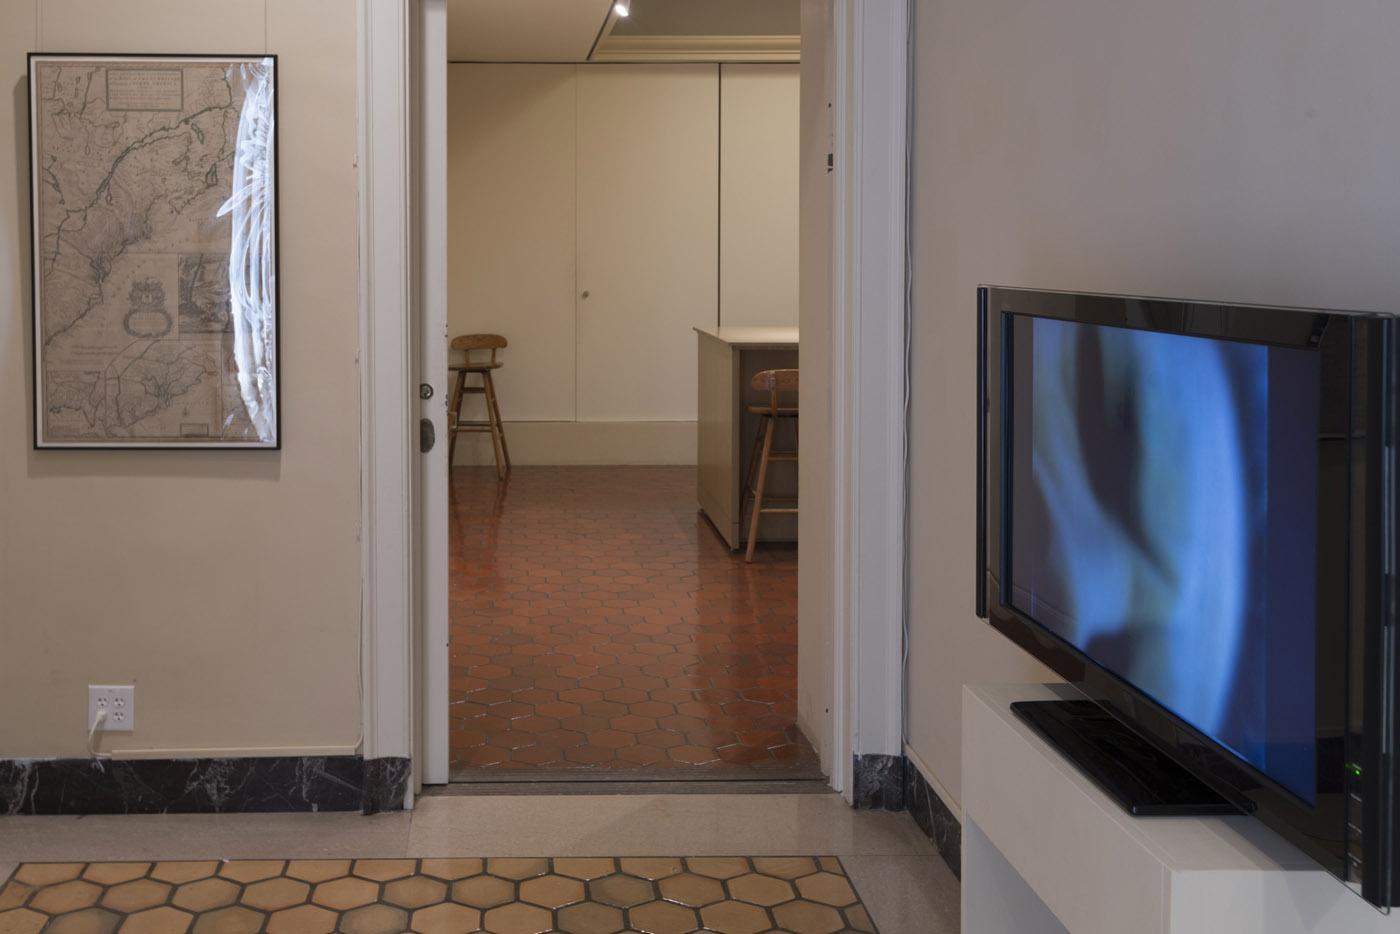 From Cindy Bernard, Vinland, Fralin Museum at the University of Virginia, 2014